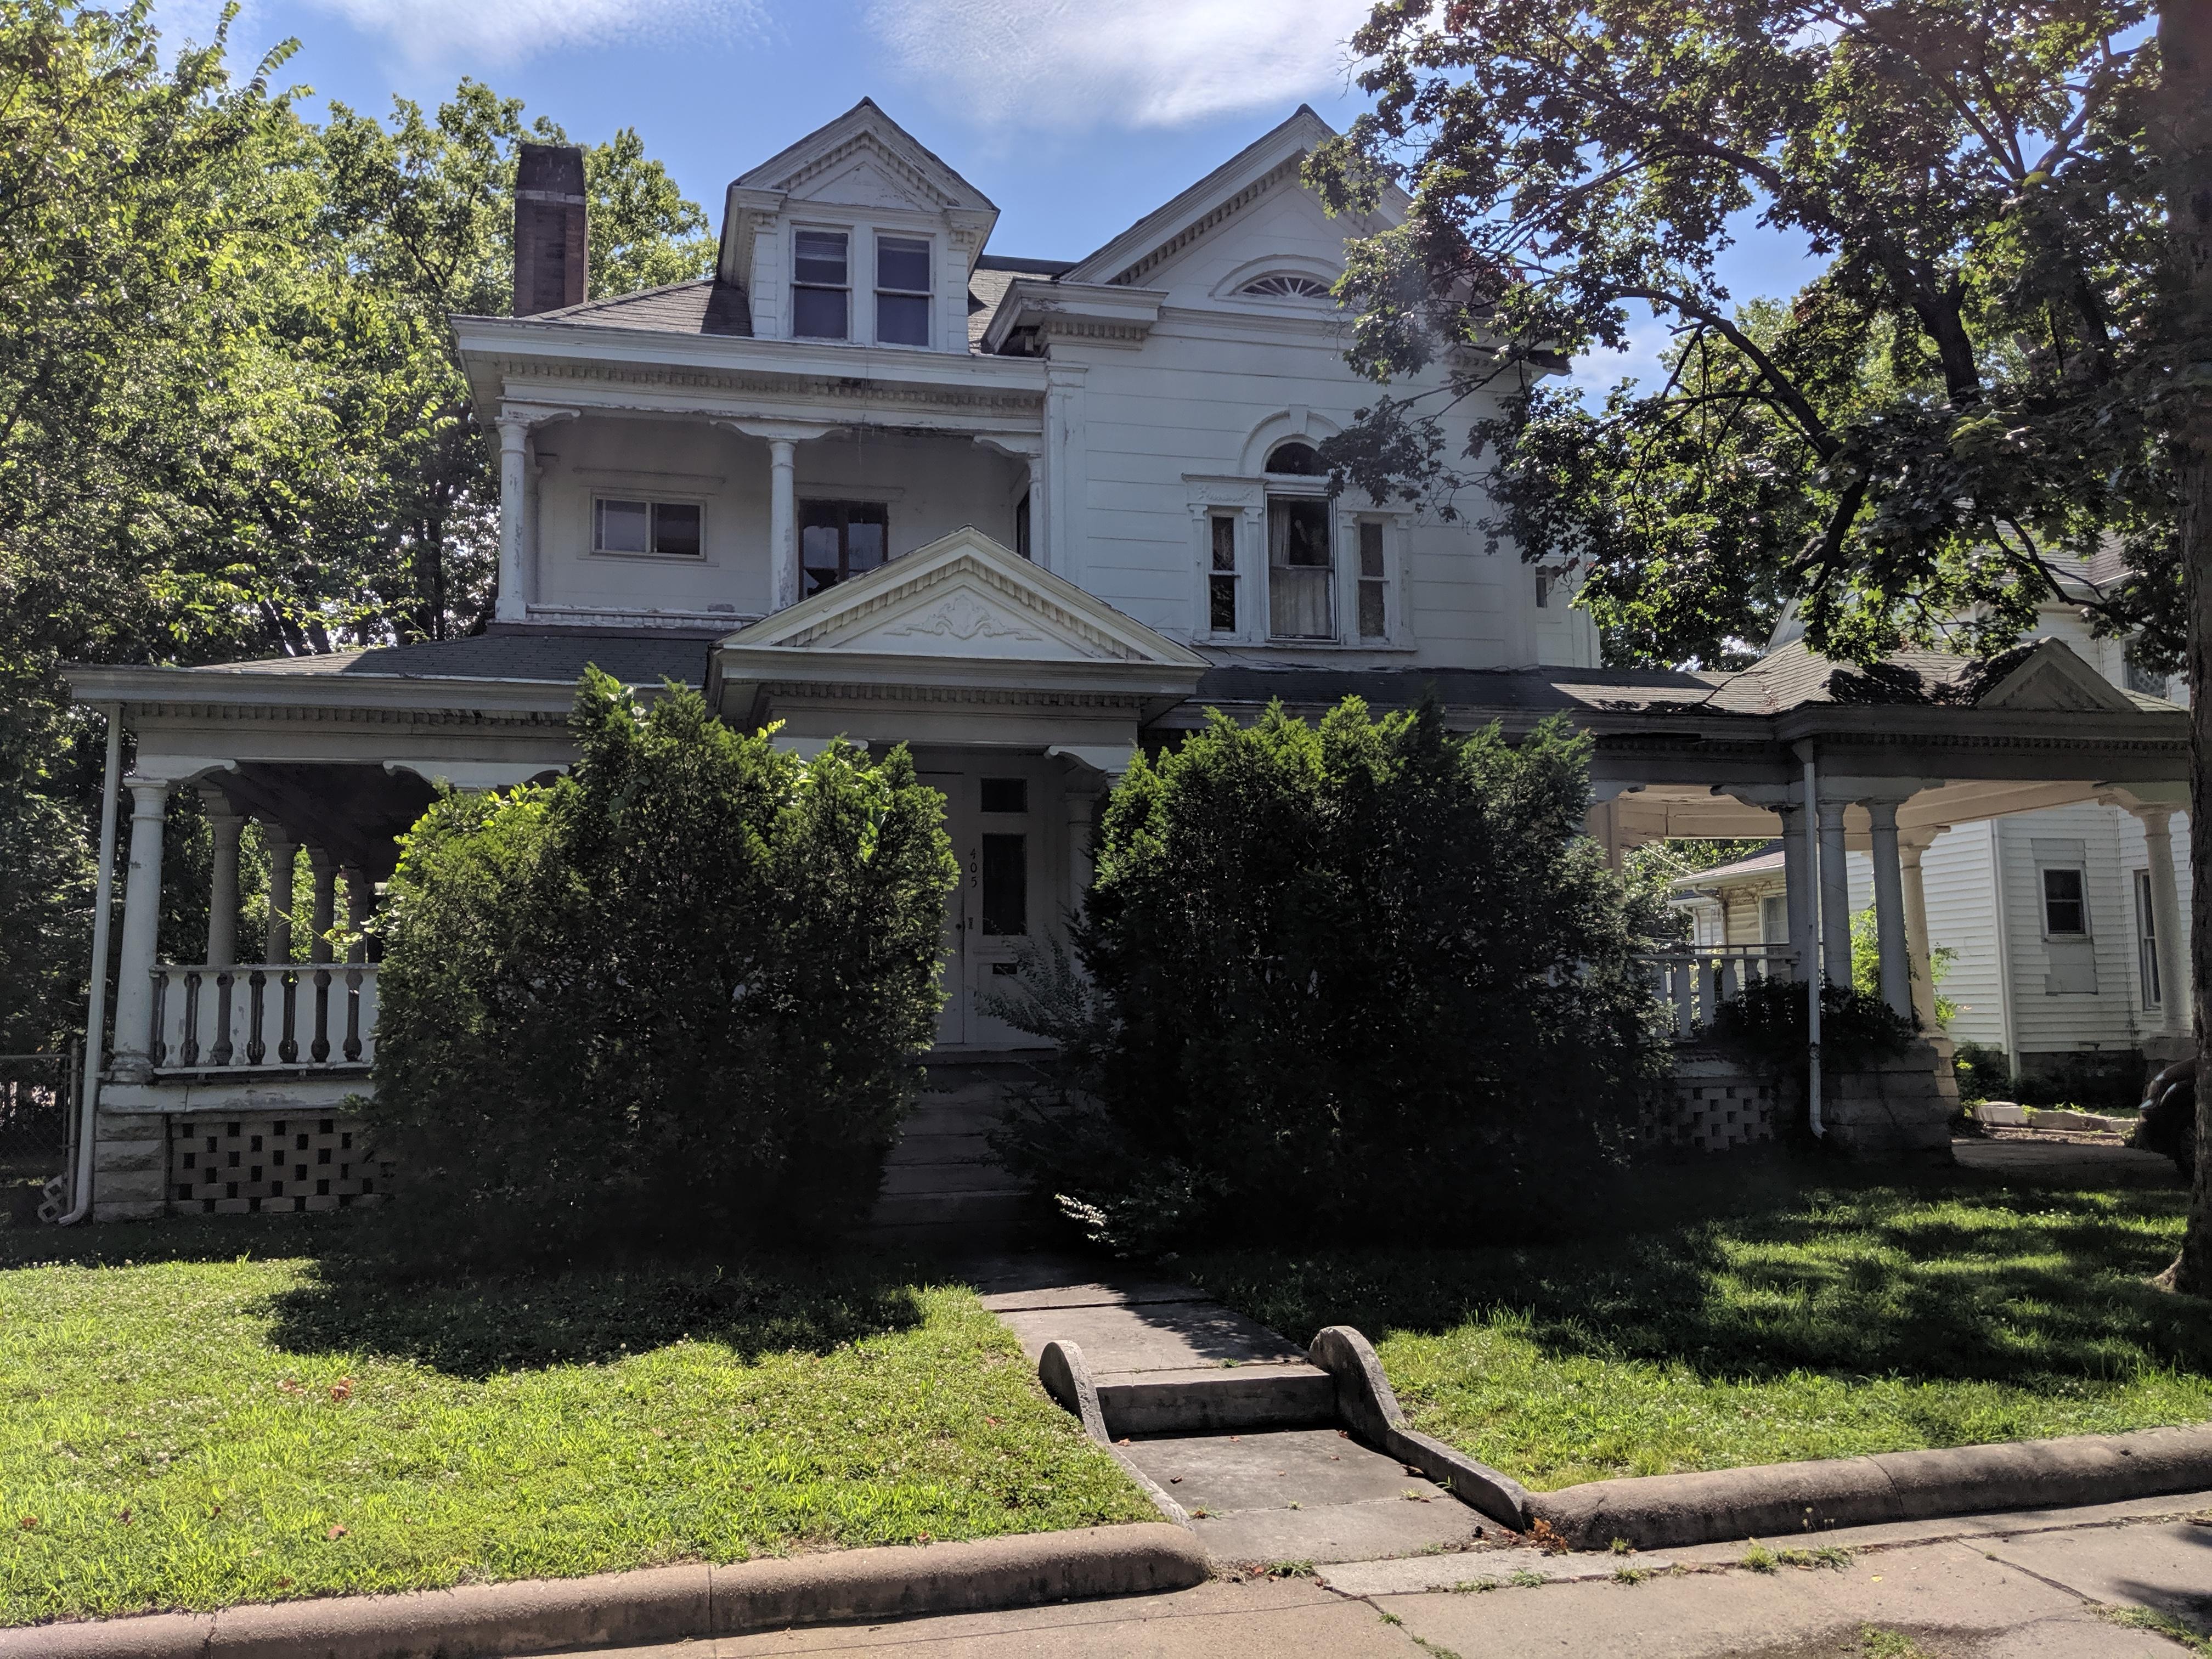 405 S Moffet Avenue Joplin, MO 64801